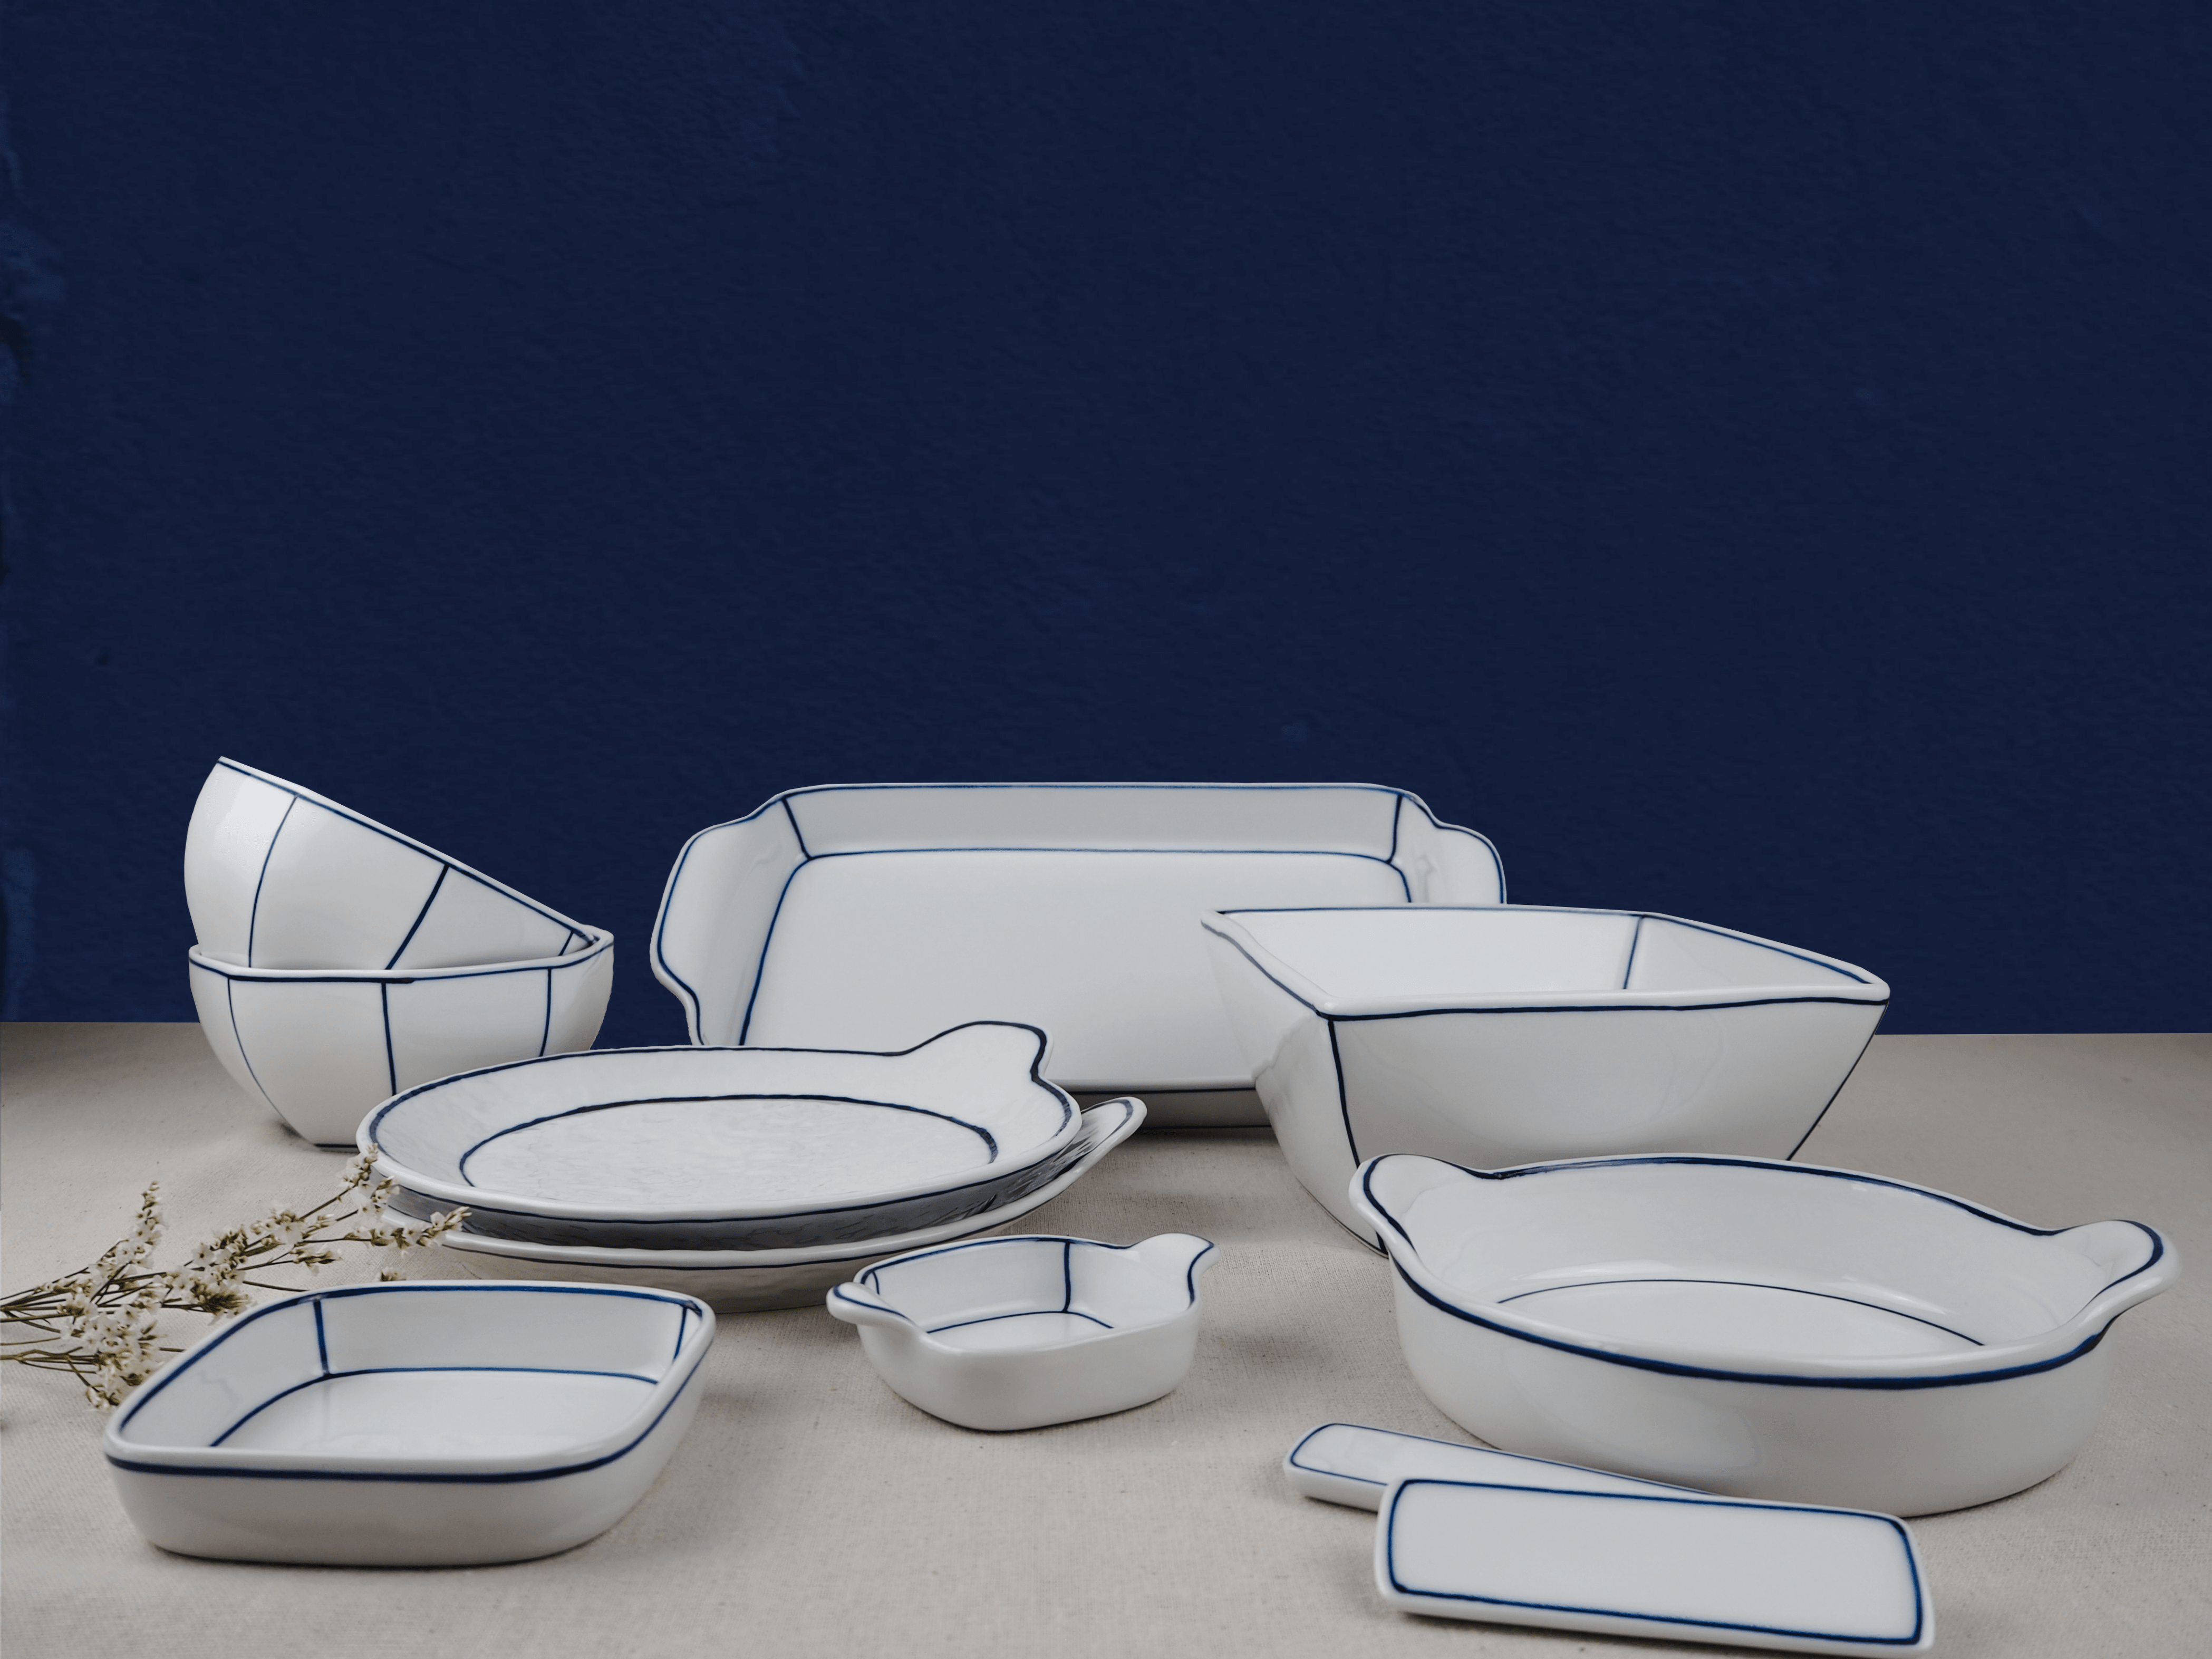 Unique handmade honeymoon diningware from Korea by Kim Seok Binn